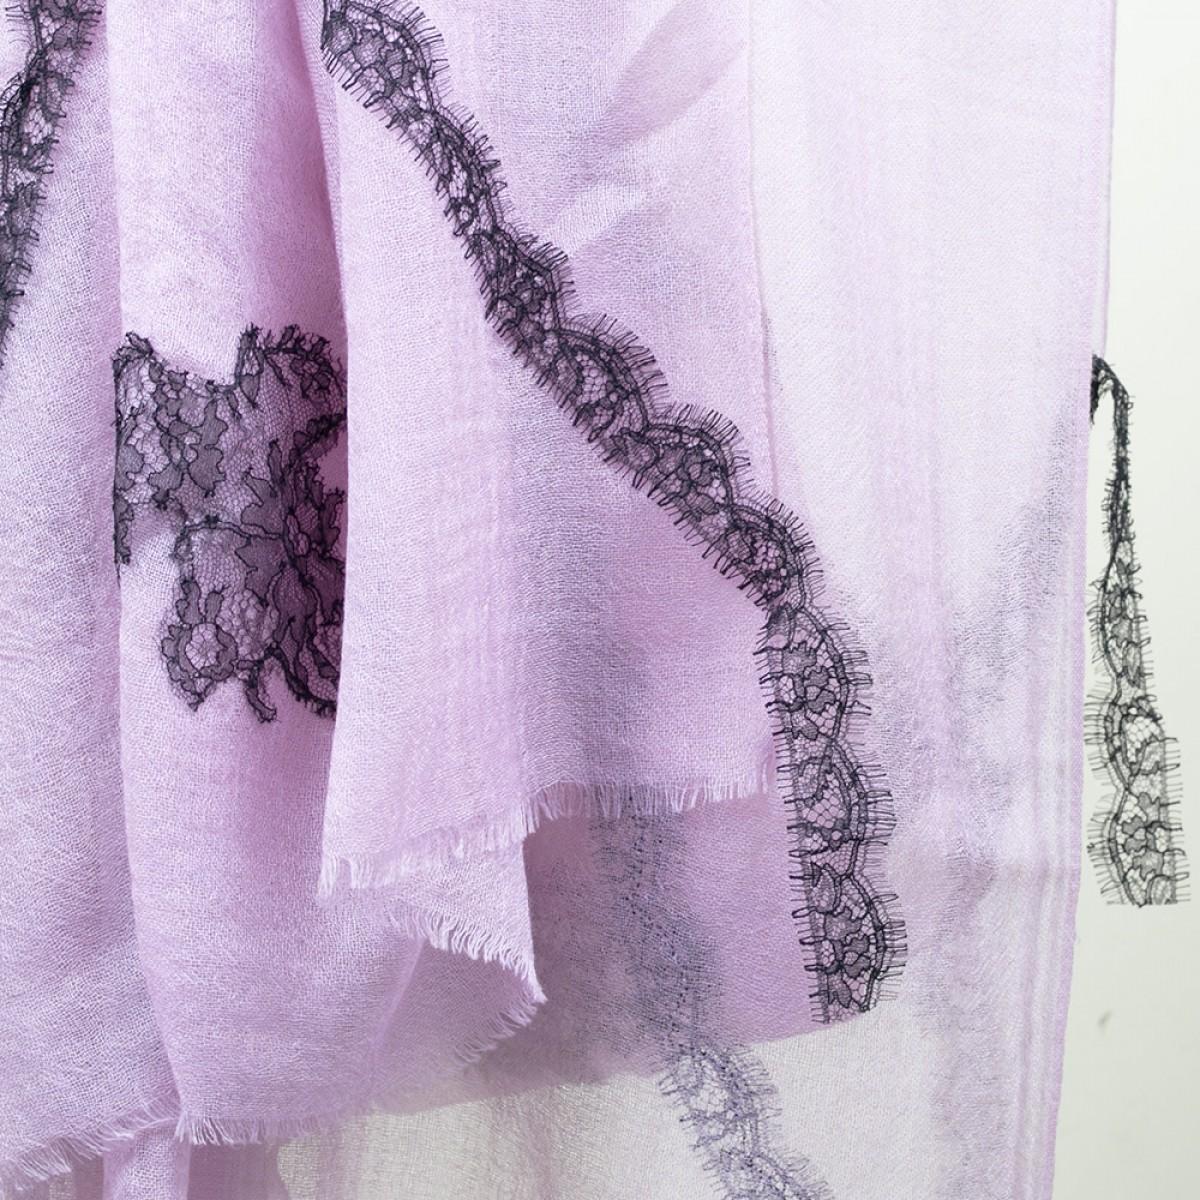 Lace Sheer Cashmere Pashmina Scarf - Mauve Purple